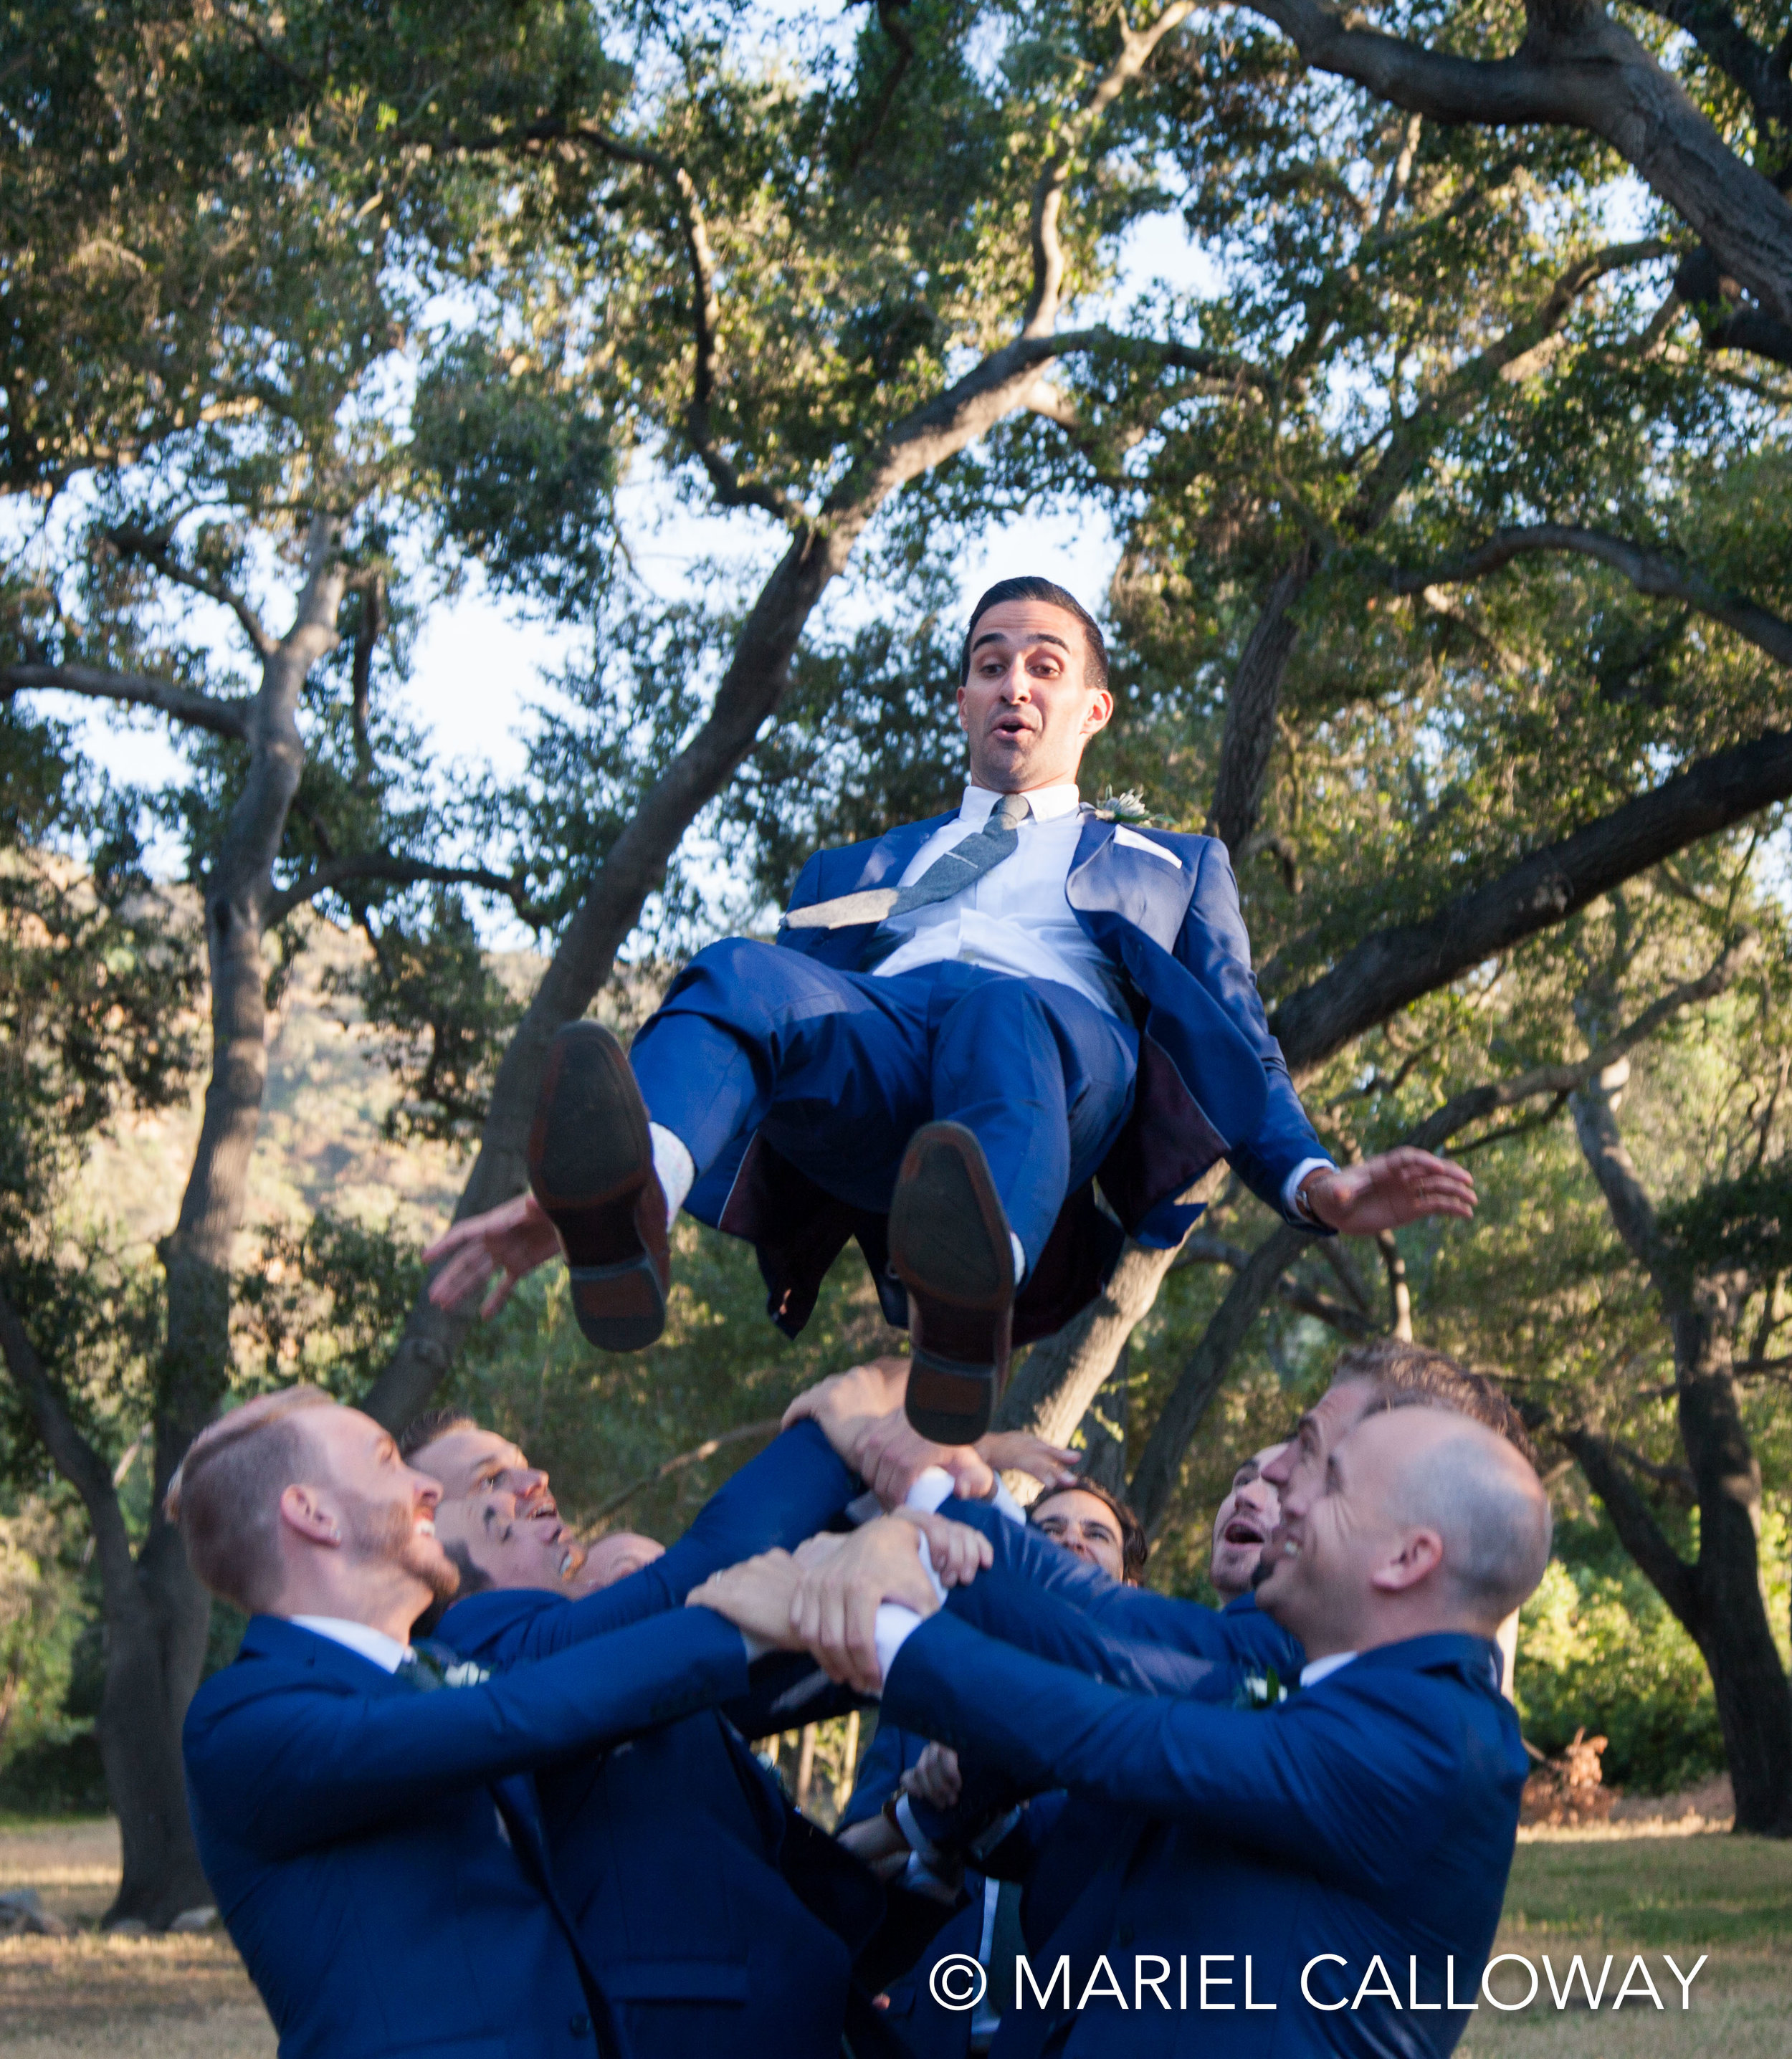 Mariel-Calloway-Los-Angeles-Wedding-Photography-Smith-34.jpg